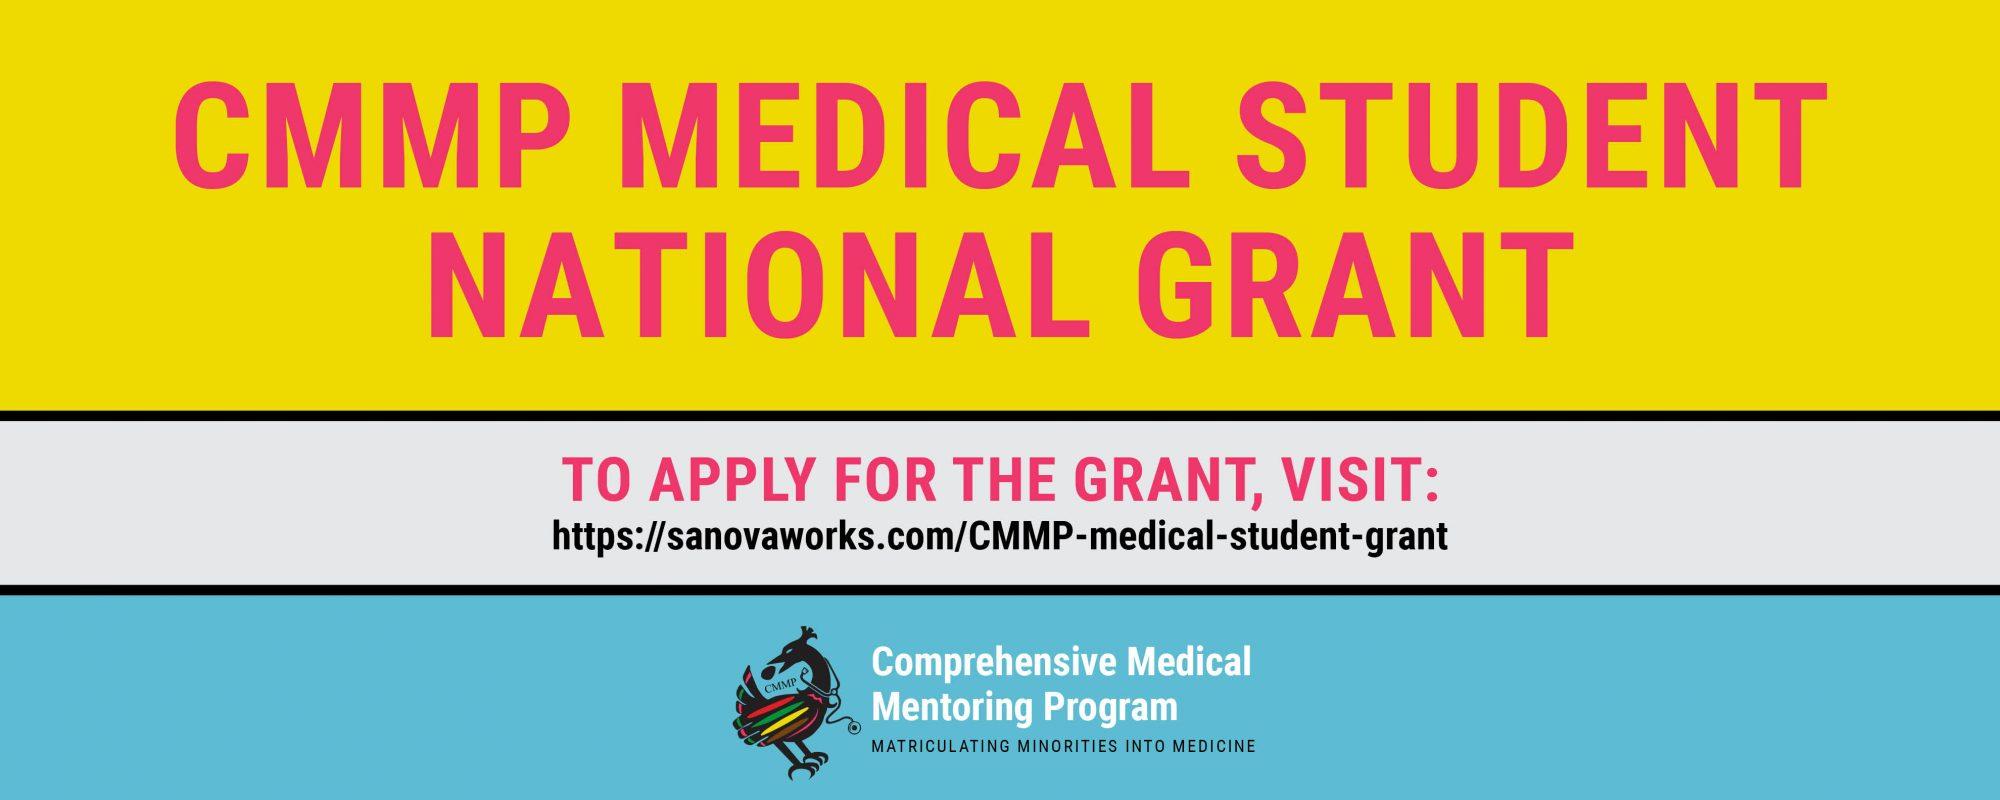 CMMP Medical School Grant